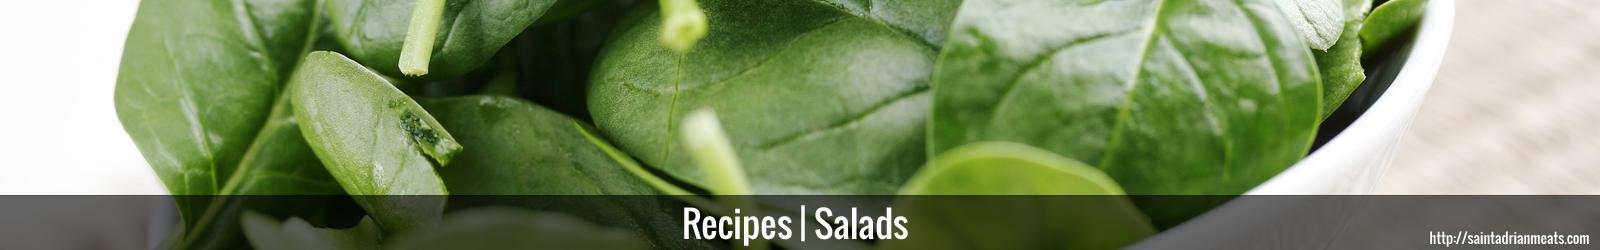 Salad Recipes | Saint Adrian Meats & Sausage | Lebanon, IN